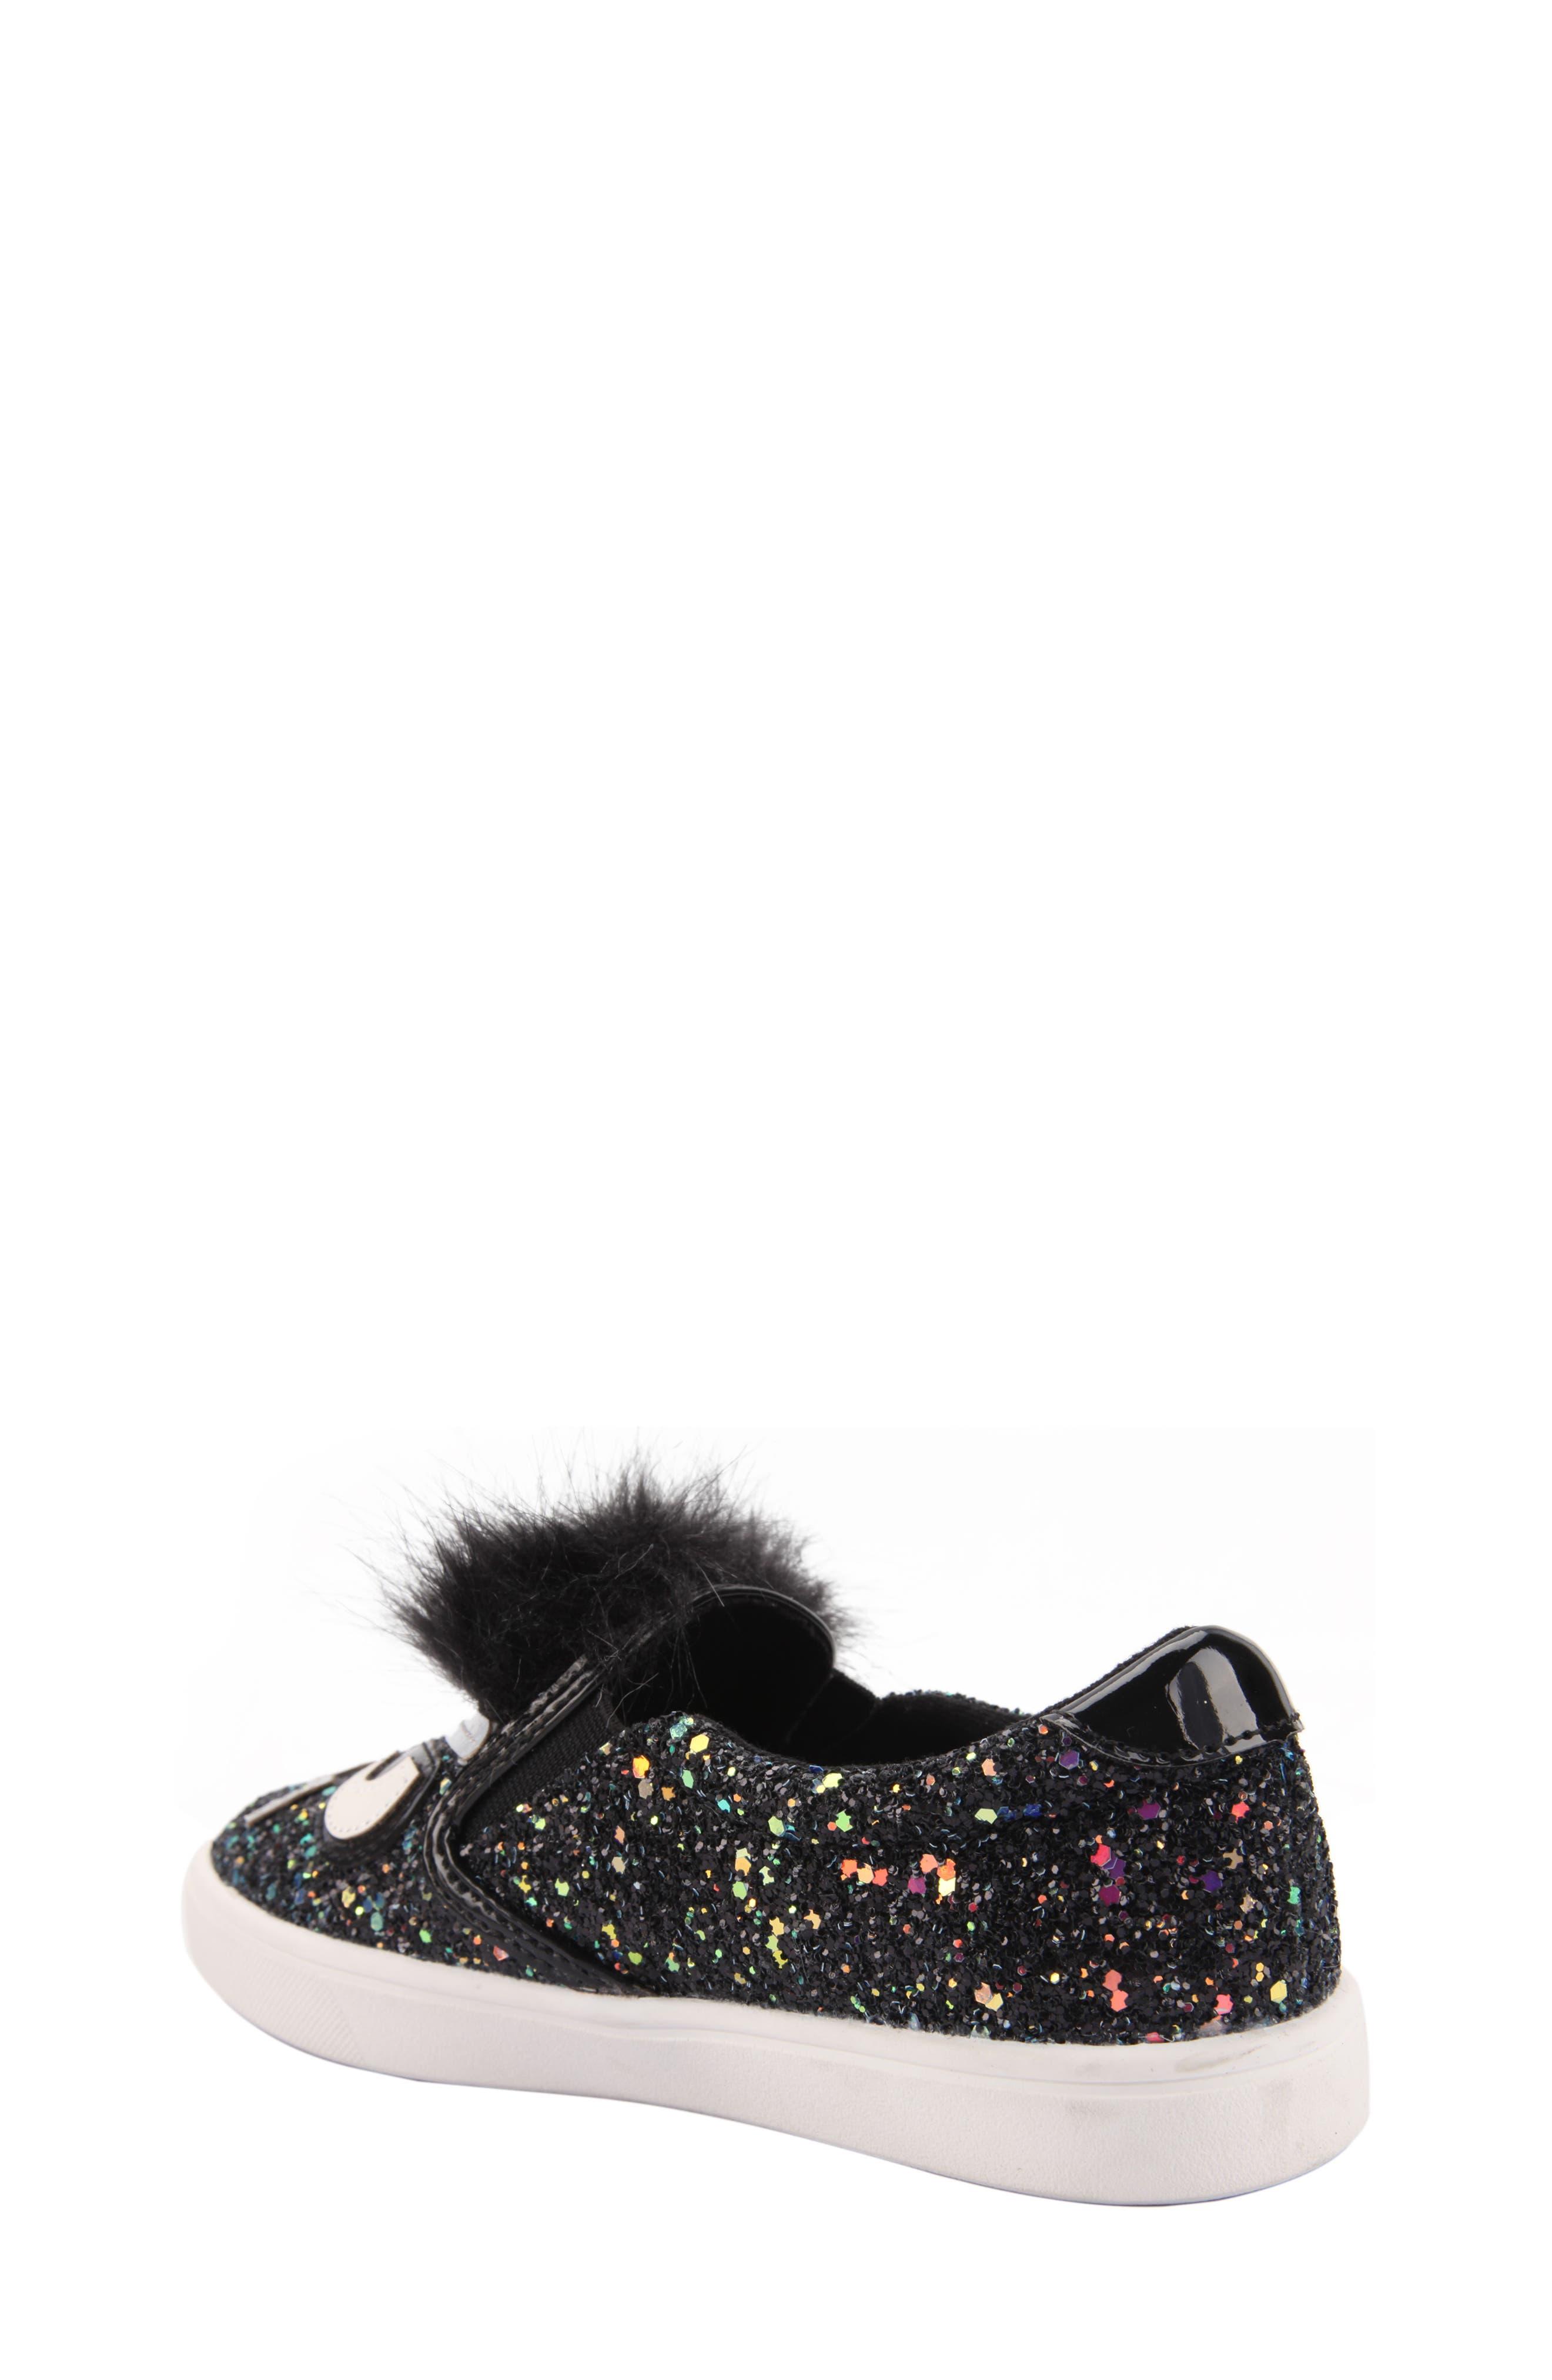 Alternate Image 2  - Nina Alyx Faux Fur Glittery Slip-On Sneaker (Walker & Toddler)